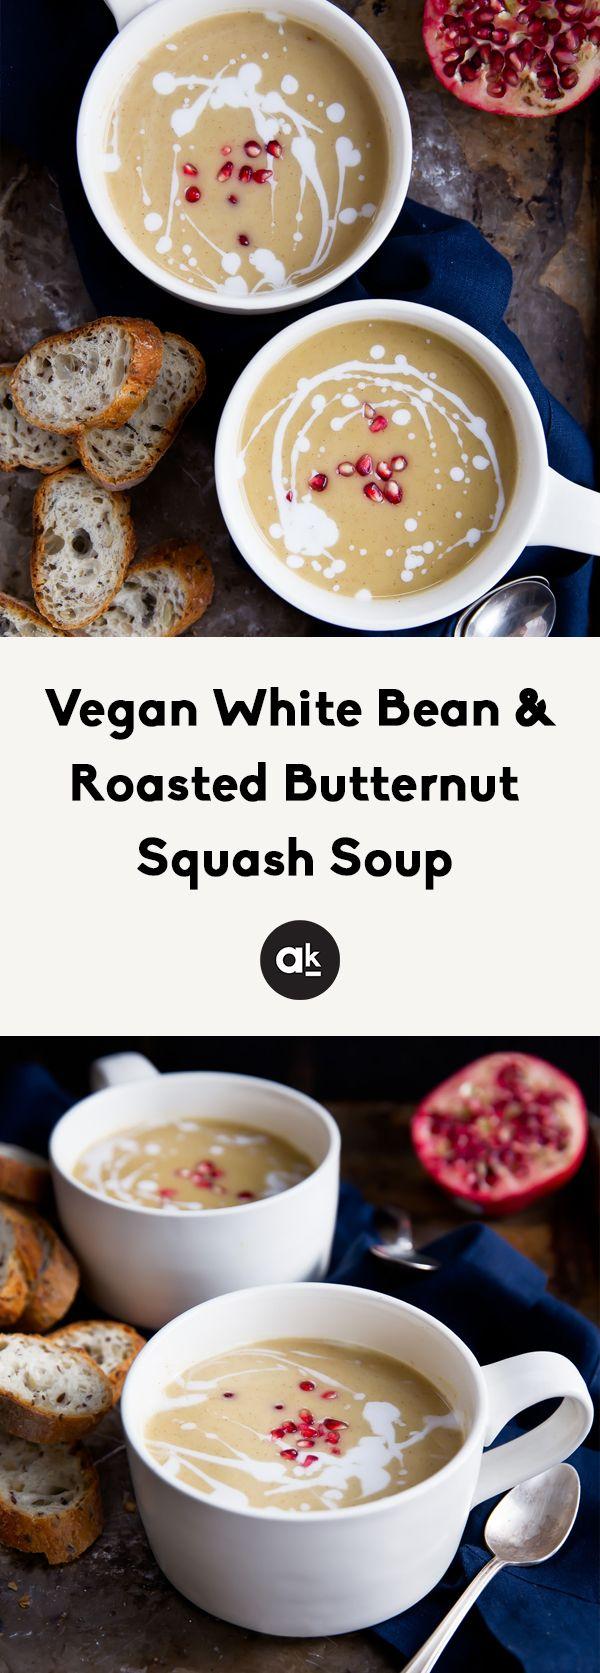 Vegan White Bean + Roasted Butternut Squash Soup #butternutsquashsoup